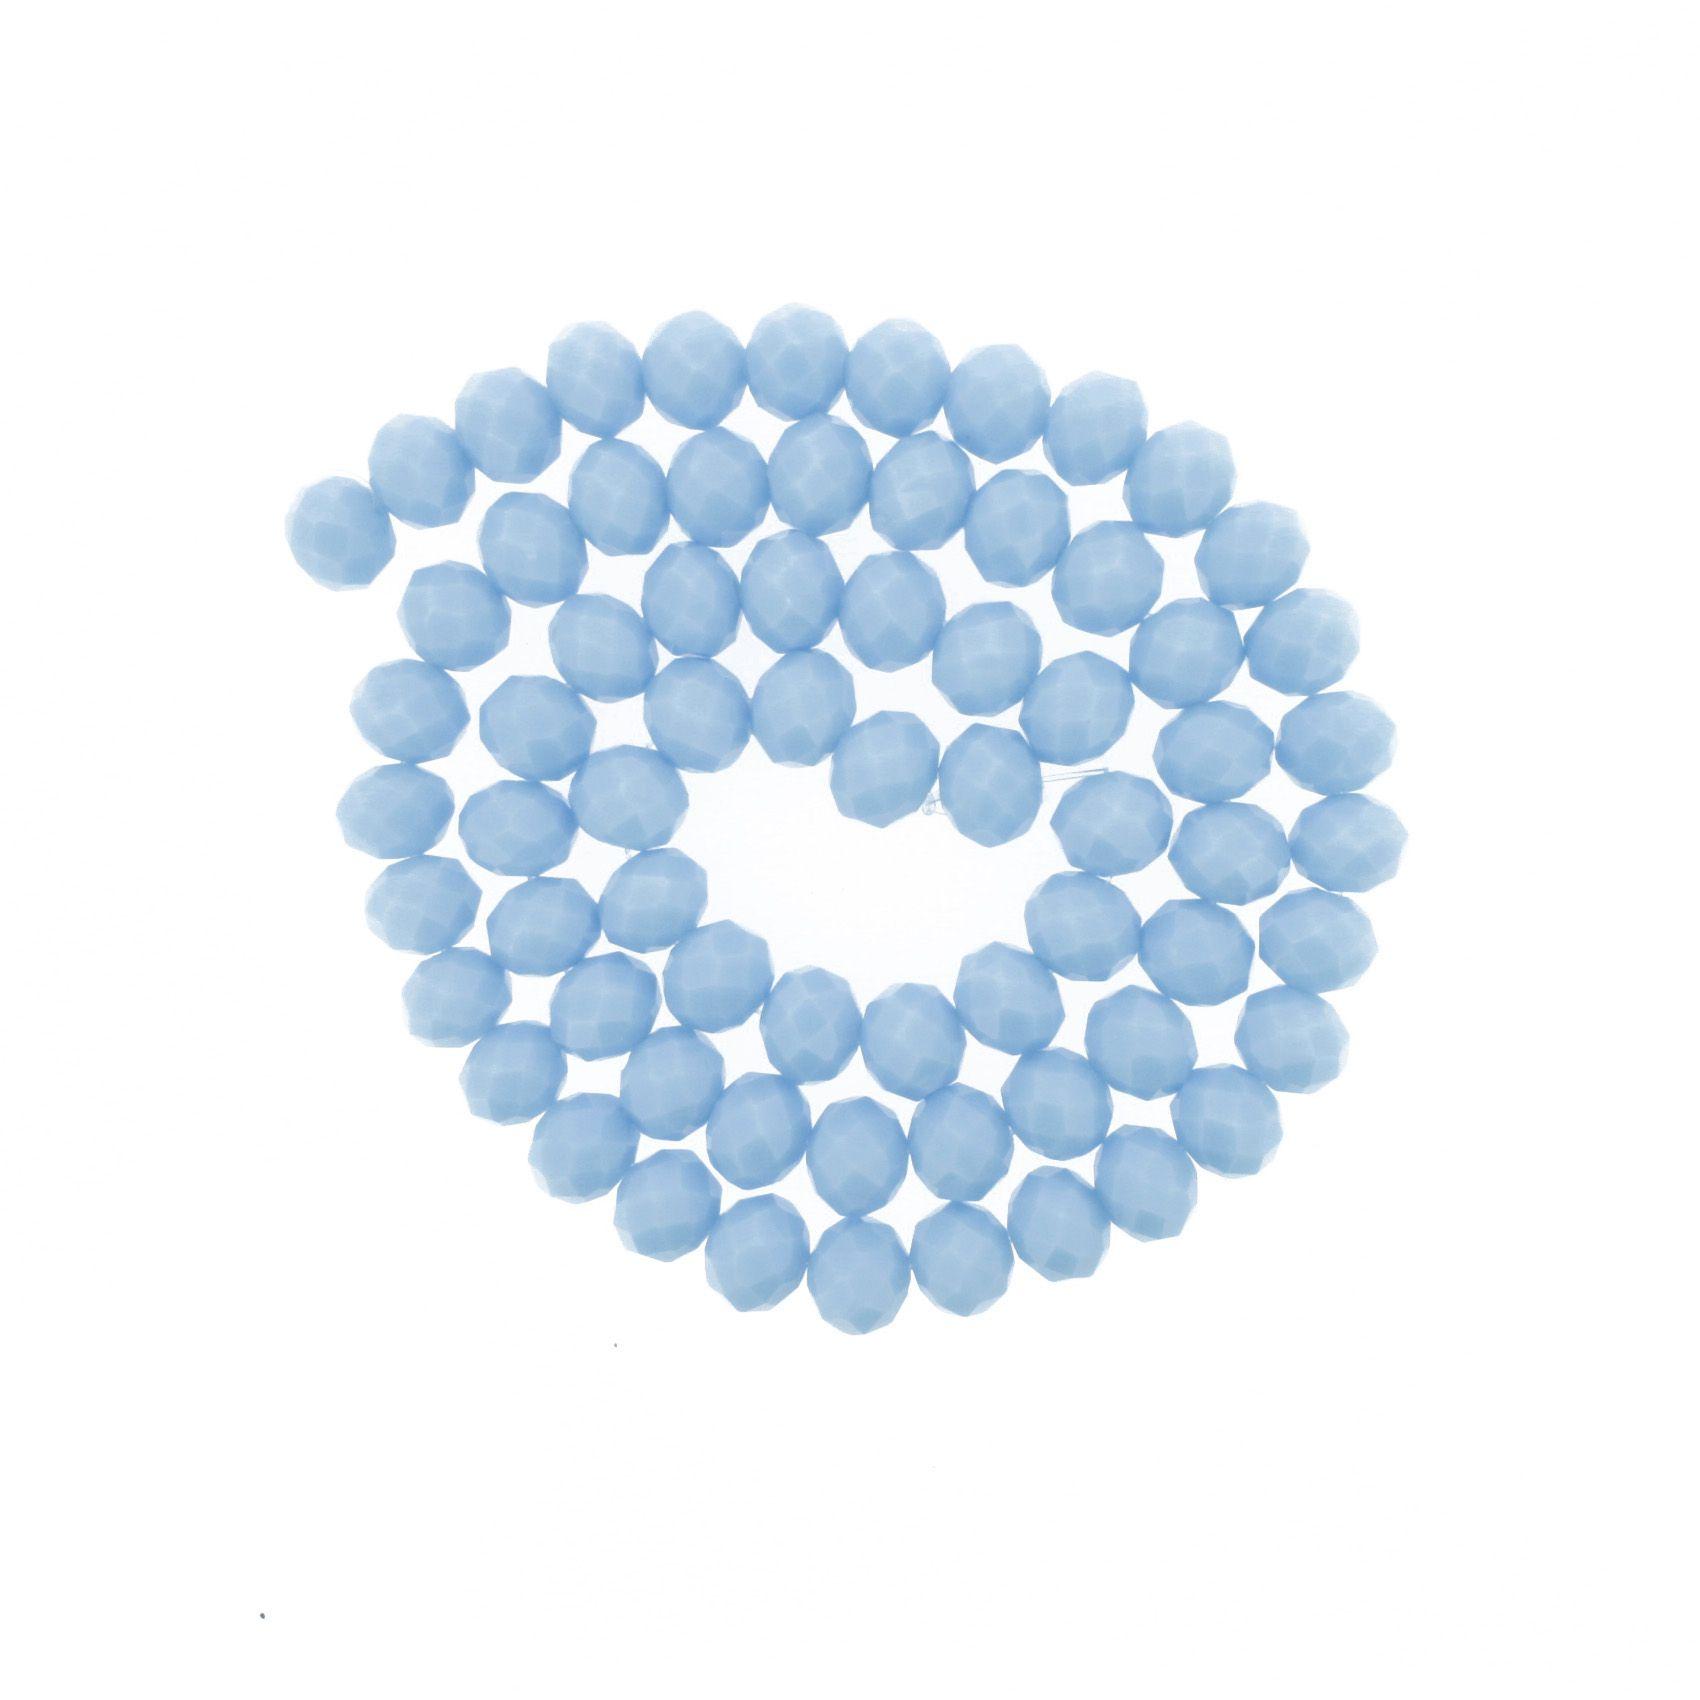 Fio de Cristal - Piatto® - Azul Claro - 10mm  - Universo Religioso® - Artigos de Umbanda e Candomblé